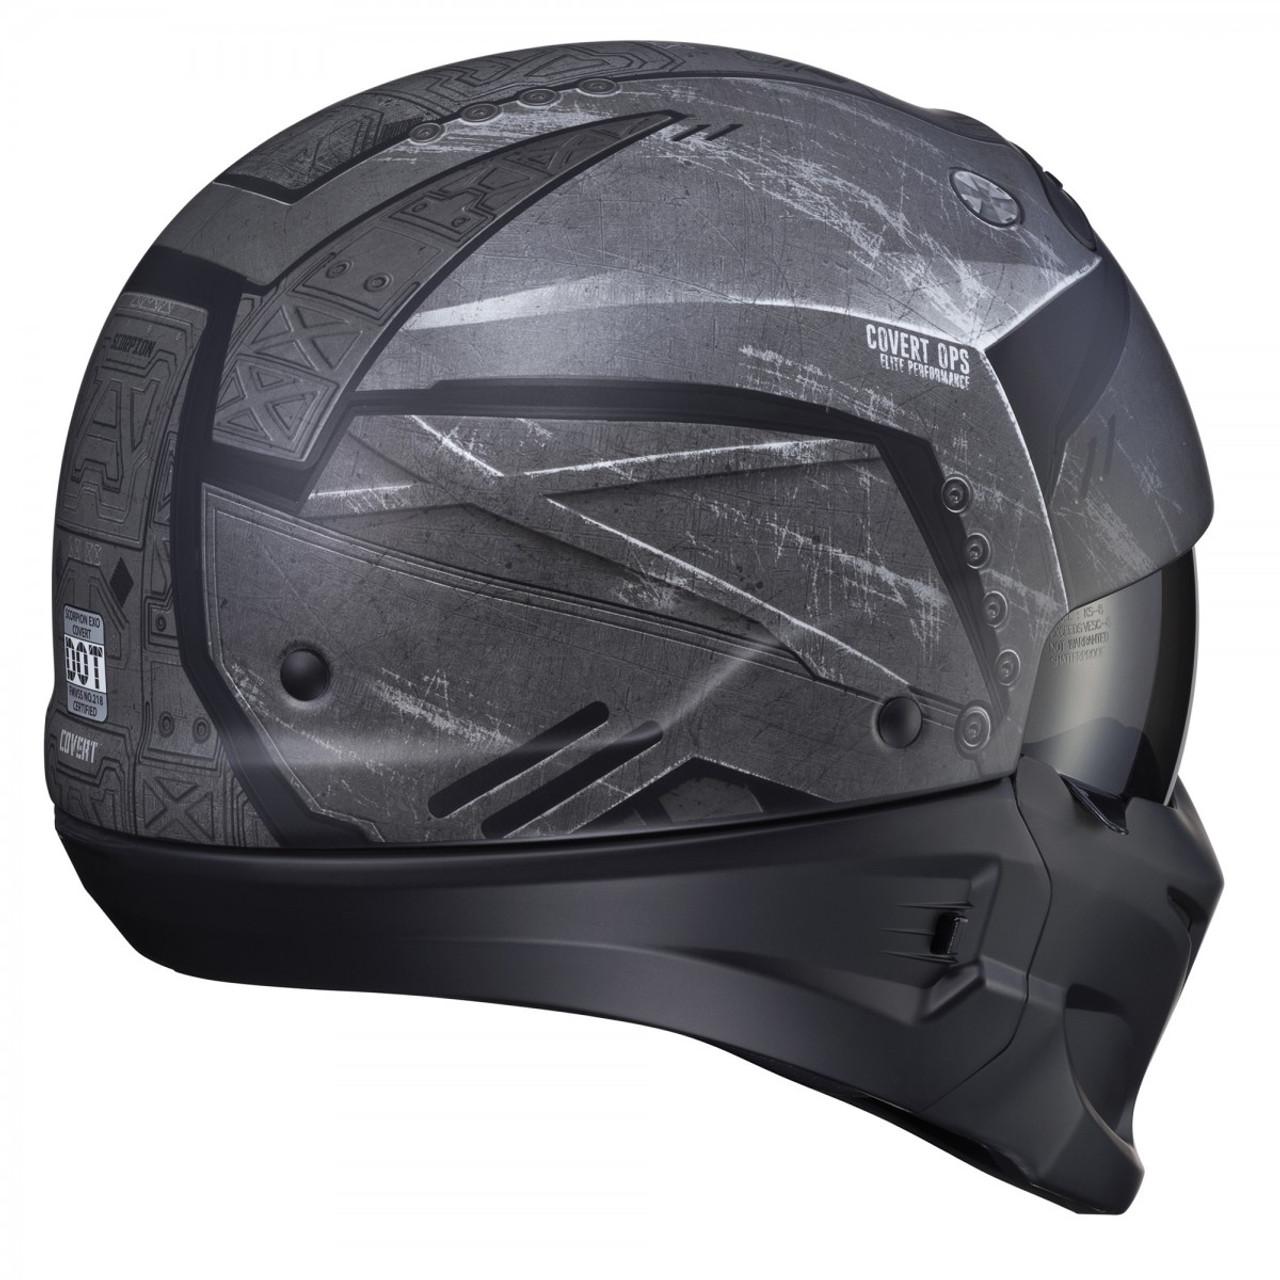 9bf4116b Scorpion Covert Incursion Phantom Motorcycle Helmet - Get Lowered Cycles